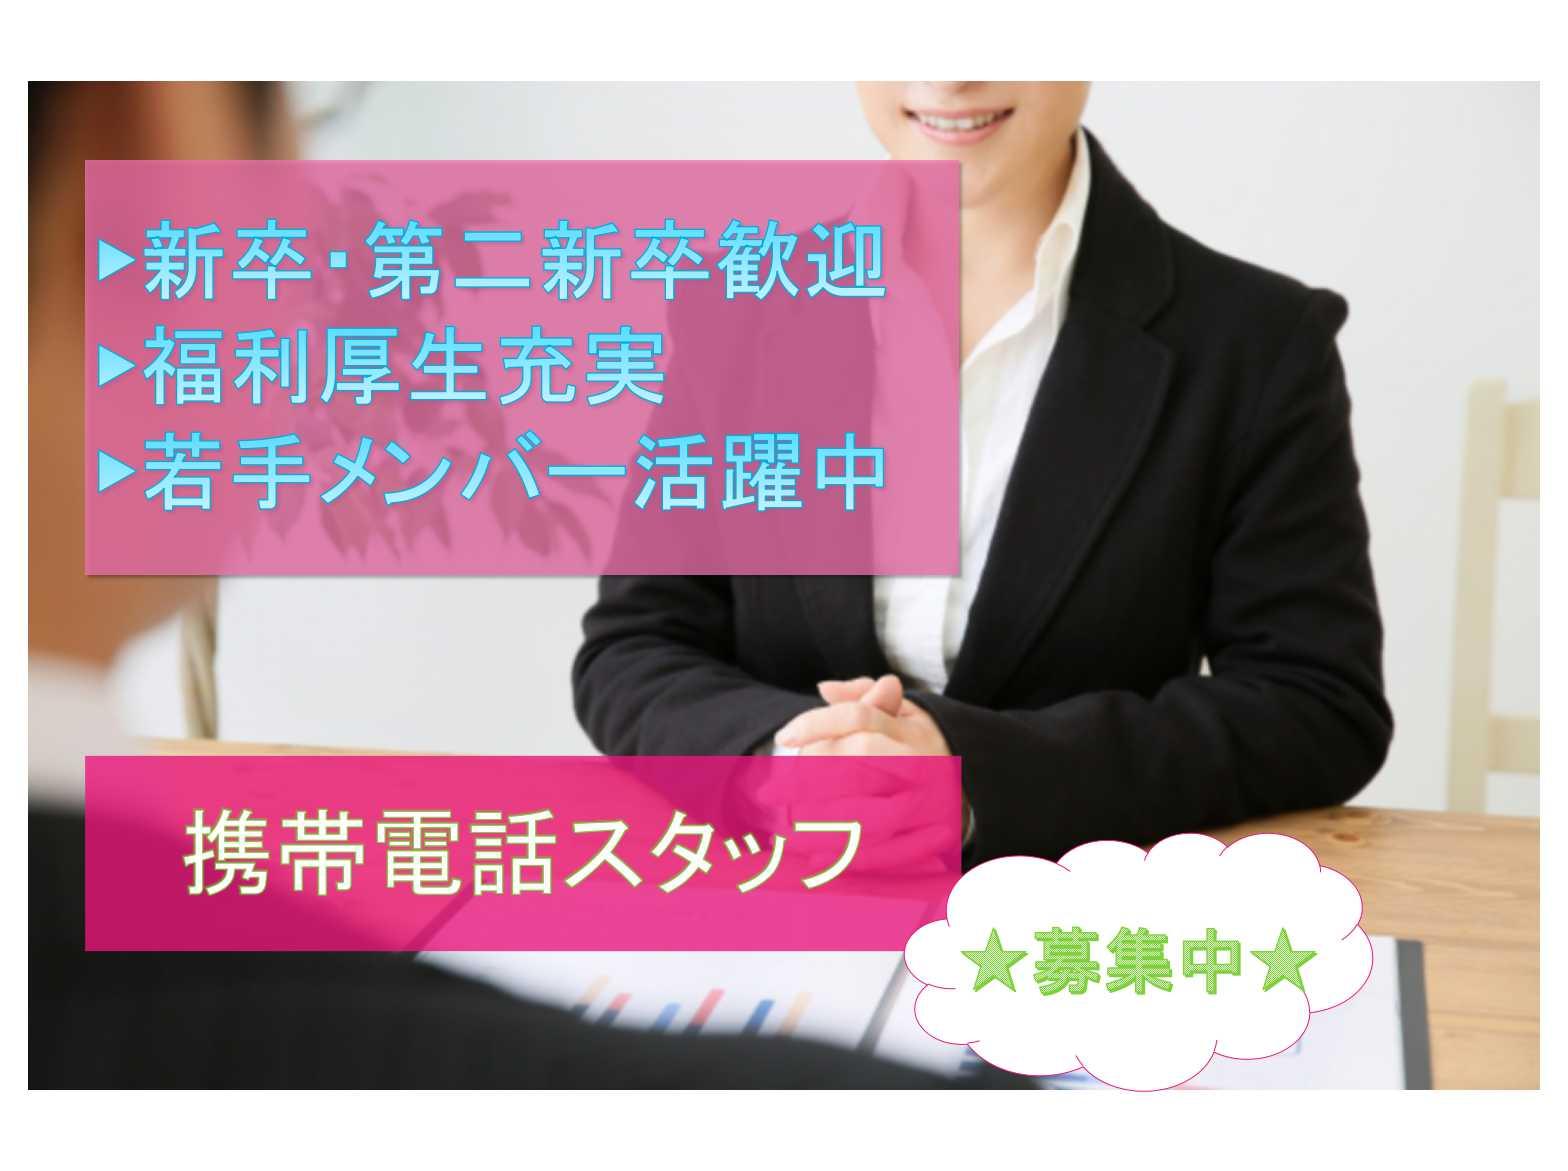 【愛知県小牧市】新卒・第二新卒歓迎◆◇若手メンバー活躍中◆◇携帯電話スタッフ募集中◆◇ イメージ